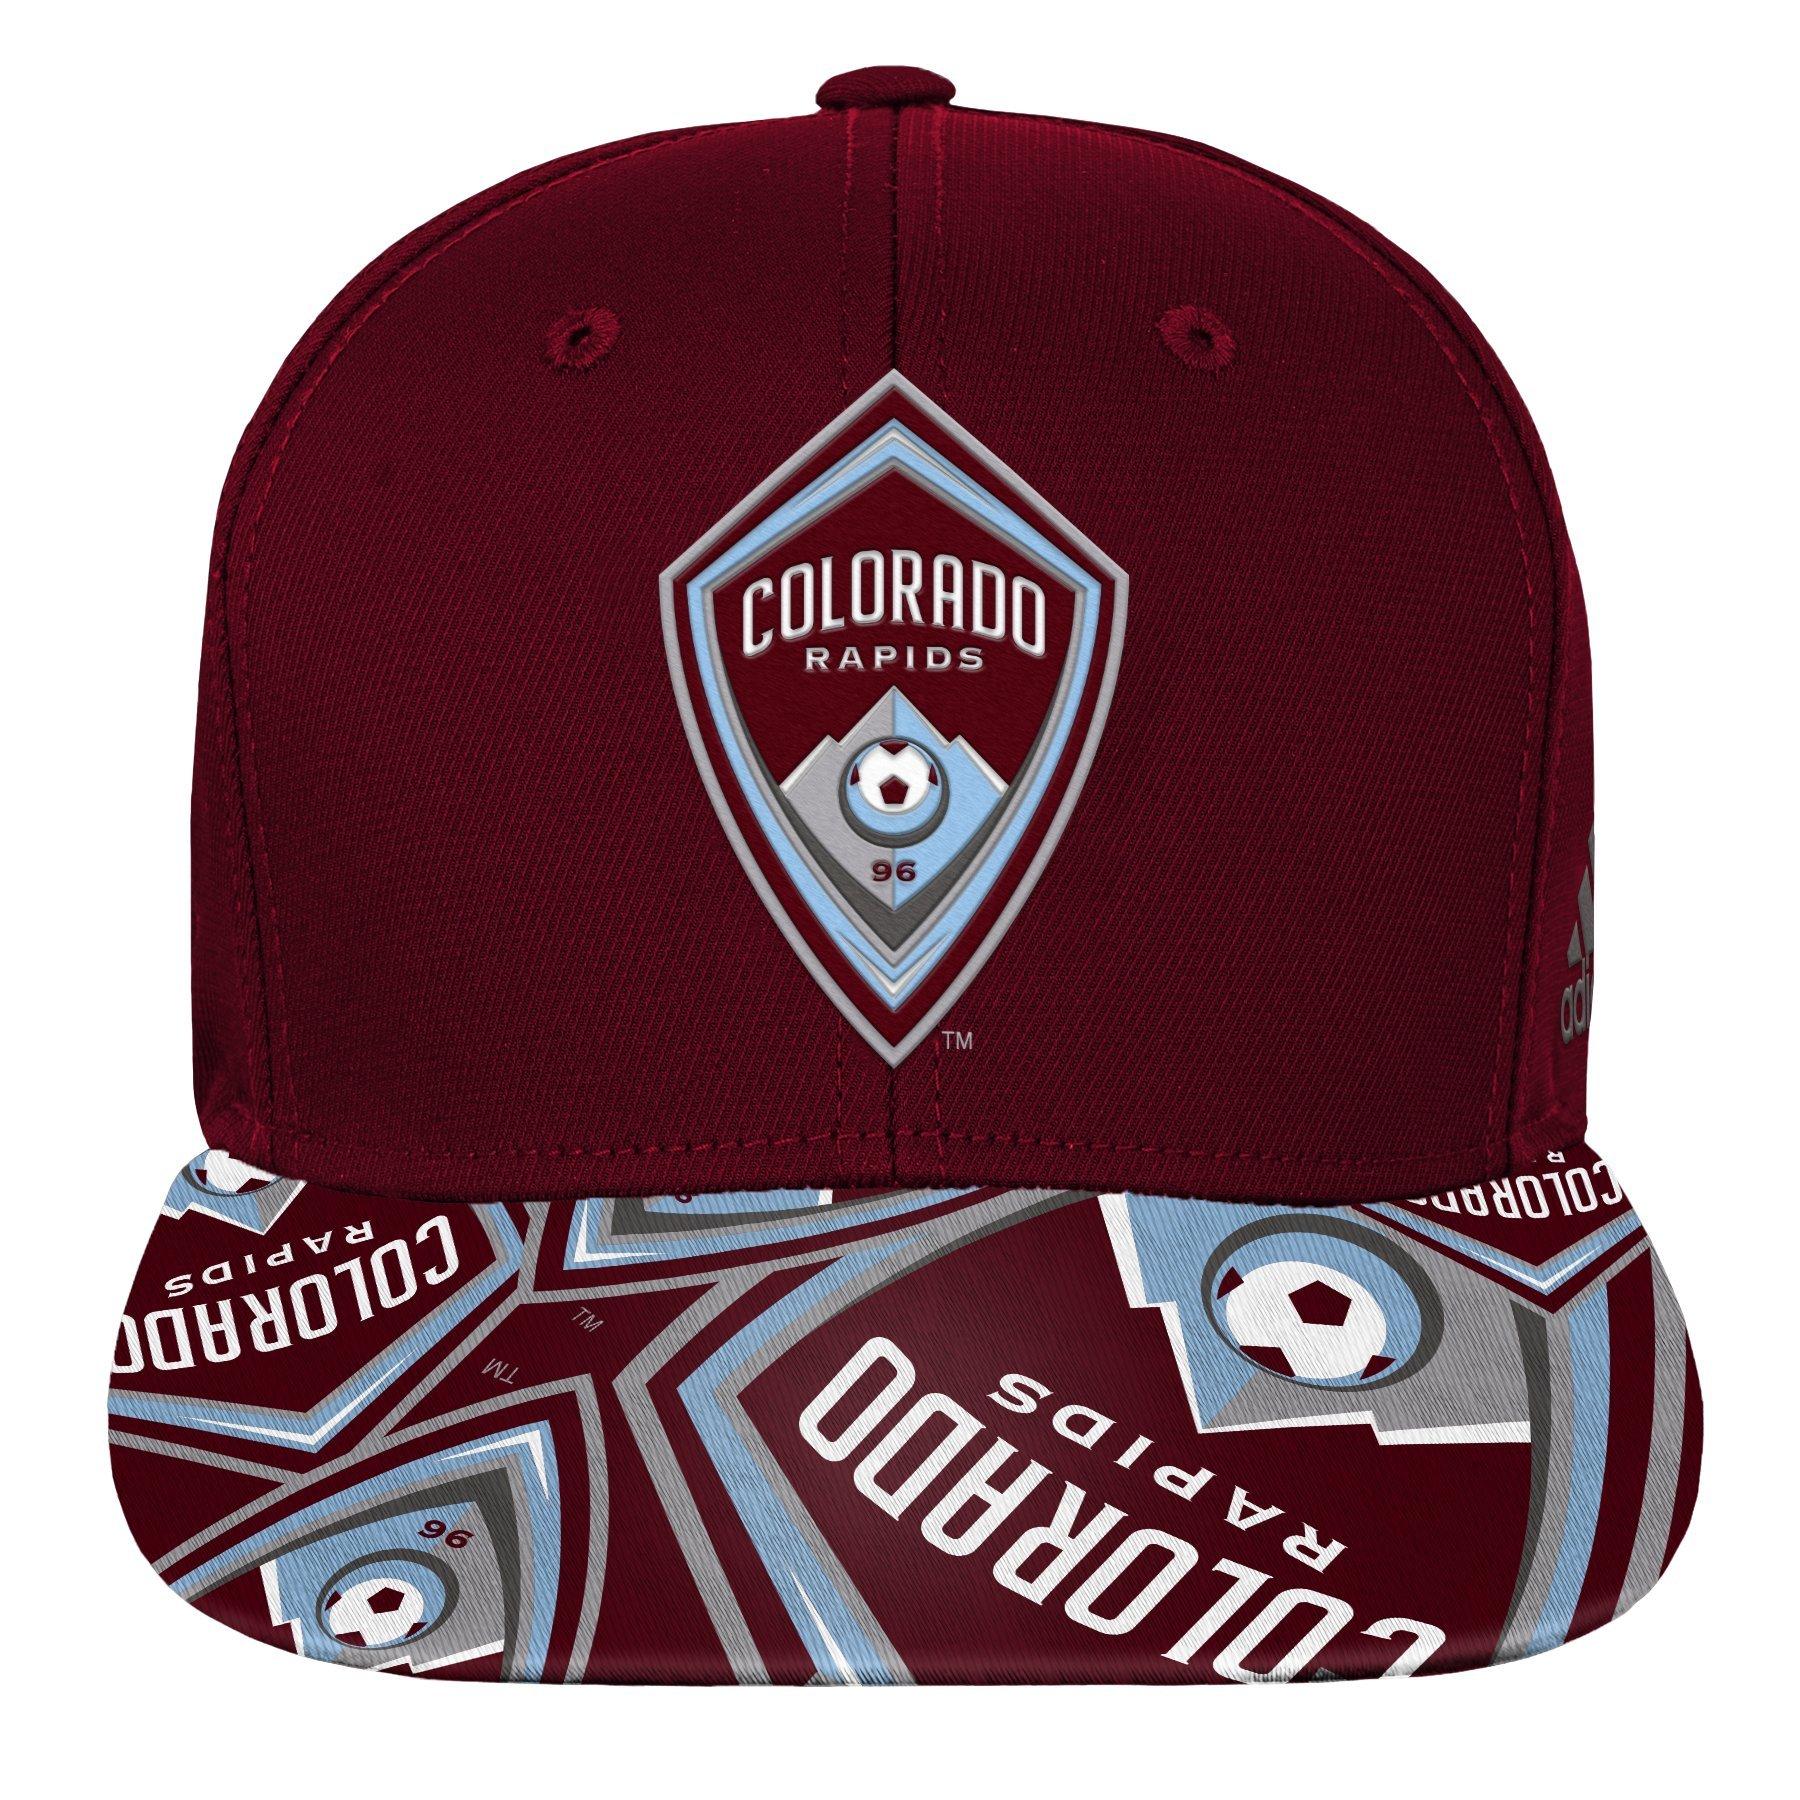 Outerstuff MLS Colorado Rapids R S8FDJ Youth Boys Flatbrim Snapback, One Size (8), Burgundy